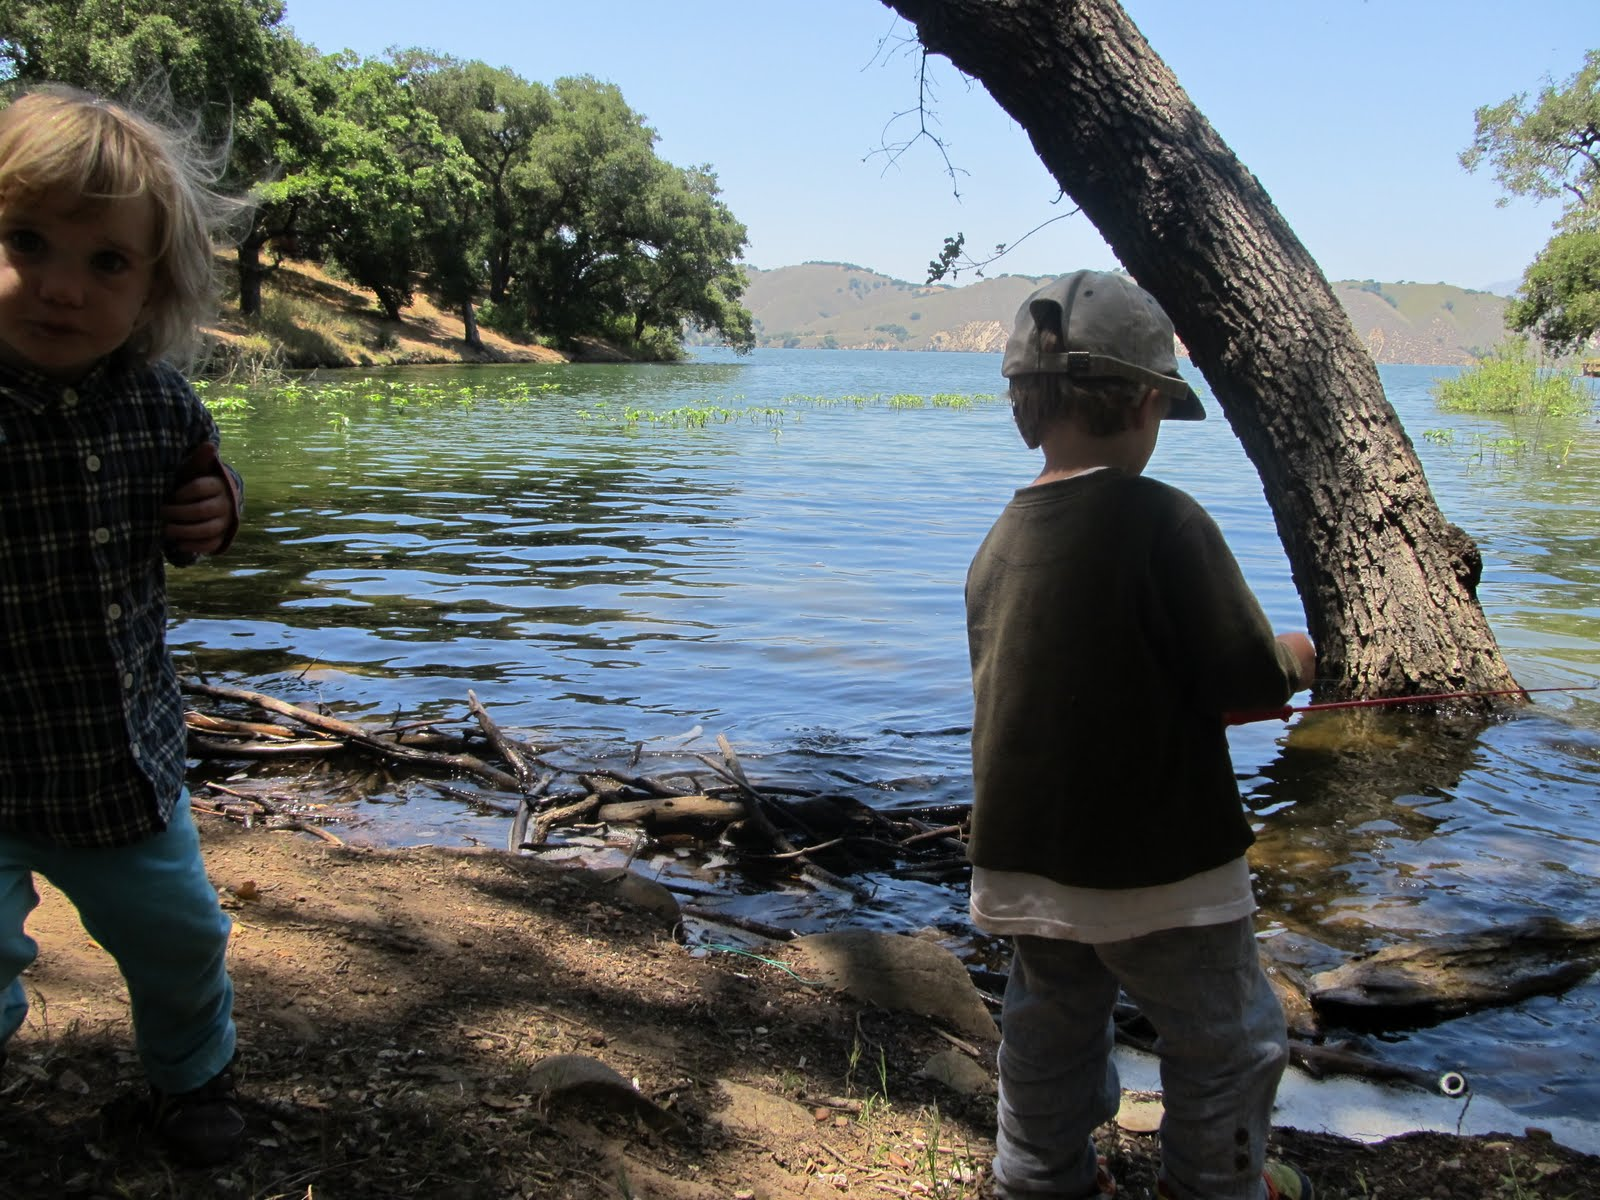 Tim burgess worldwide lake cachuma camping trip june 10 for Lake cachuma fishing report